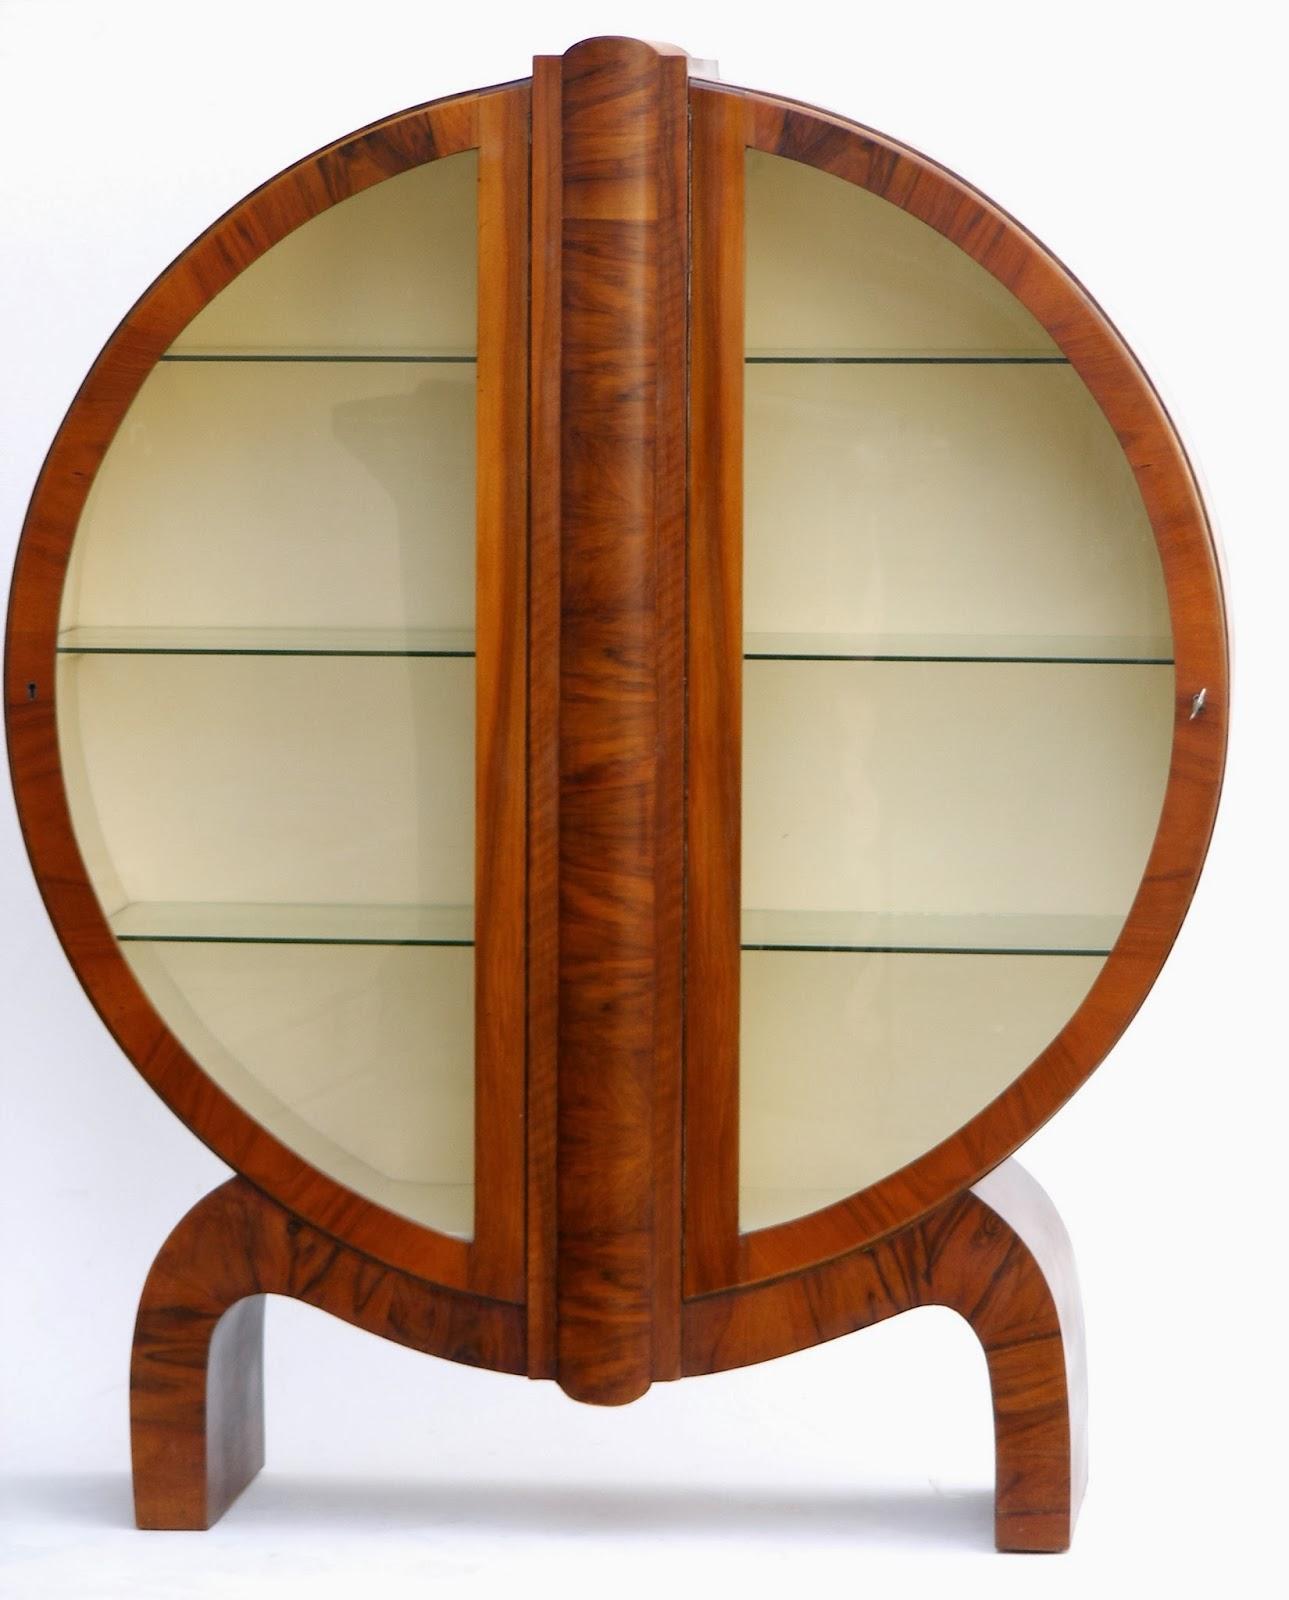 12 Art Deco Kitchen Designs And Furniture: VAMP FURNITURE: This Weeks New Furniture At Vamp